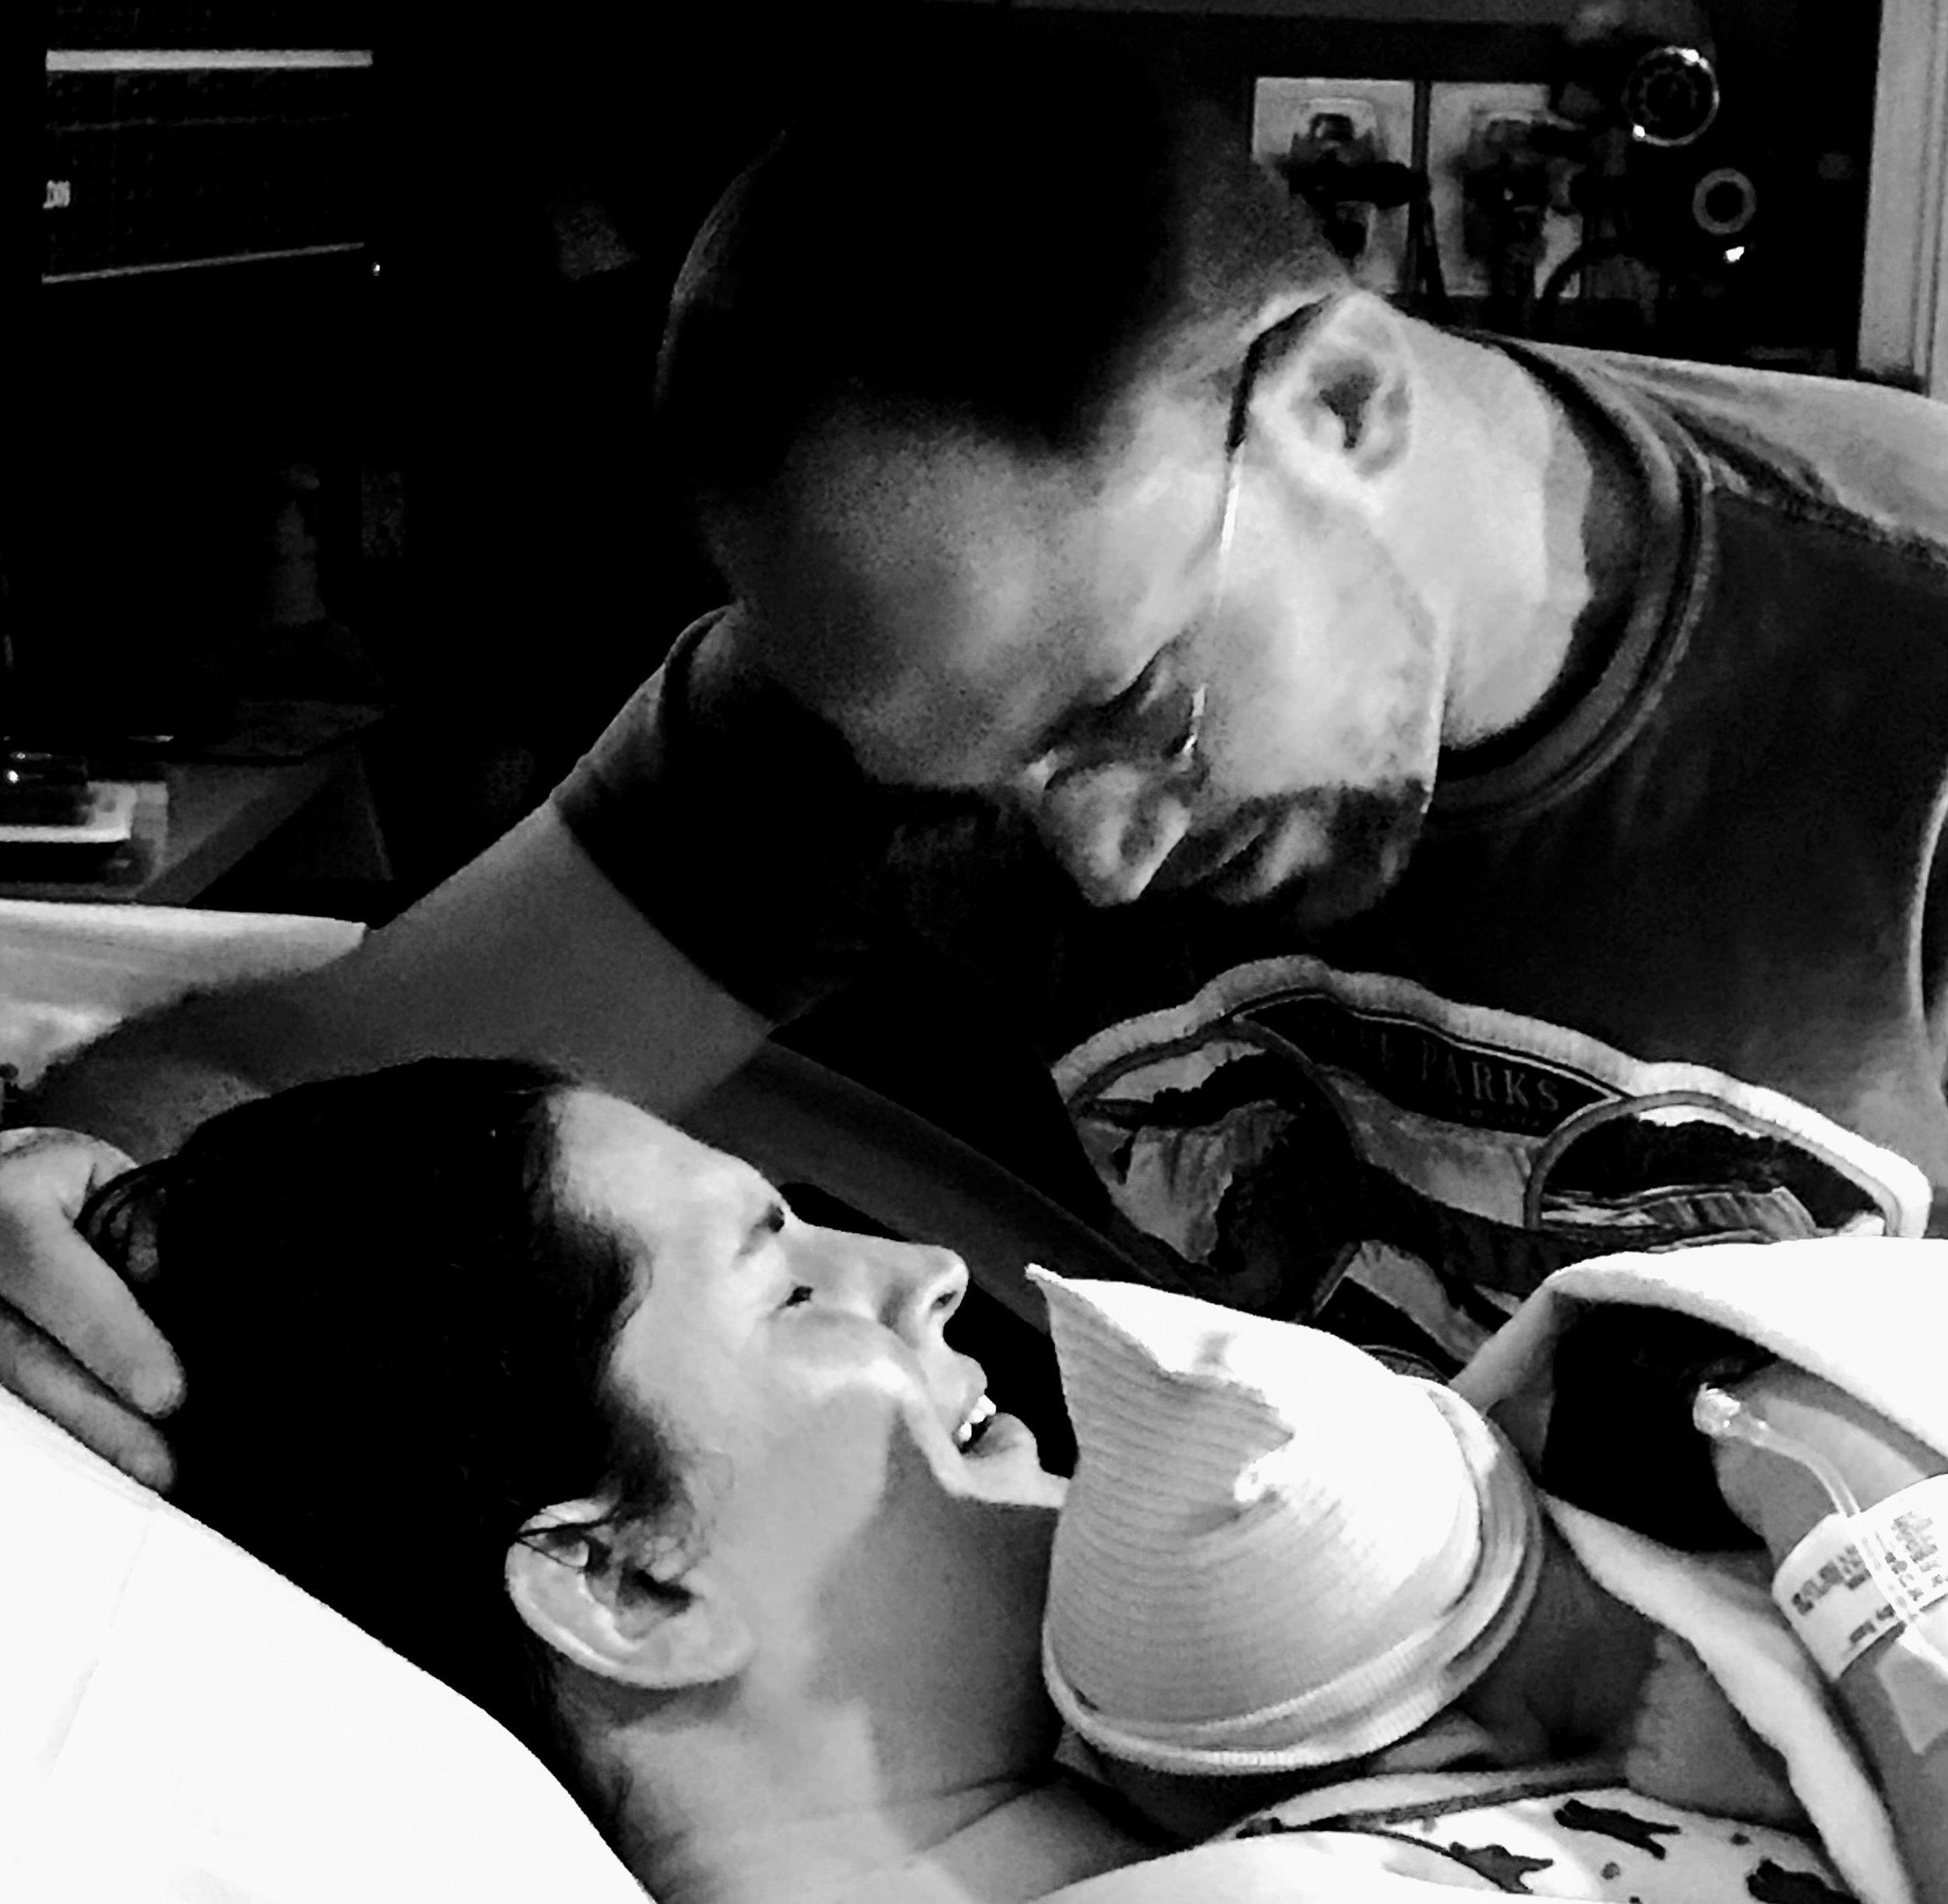 VBAC joy! At  Inova Fair Oaks Hospital  with  Dr. Hashemi from Centreville OB/GYN , and Tabitha Kaza from Heaven&birth